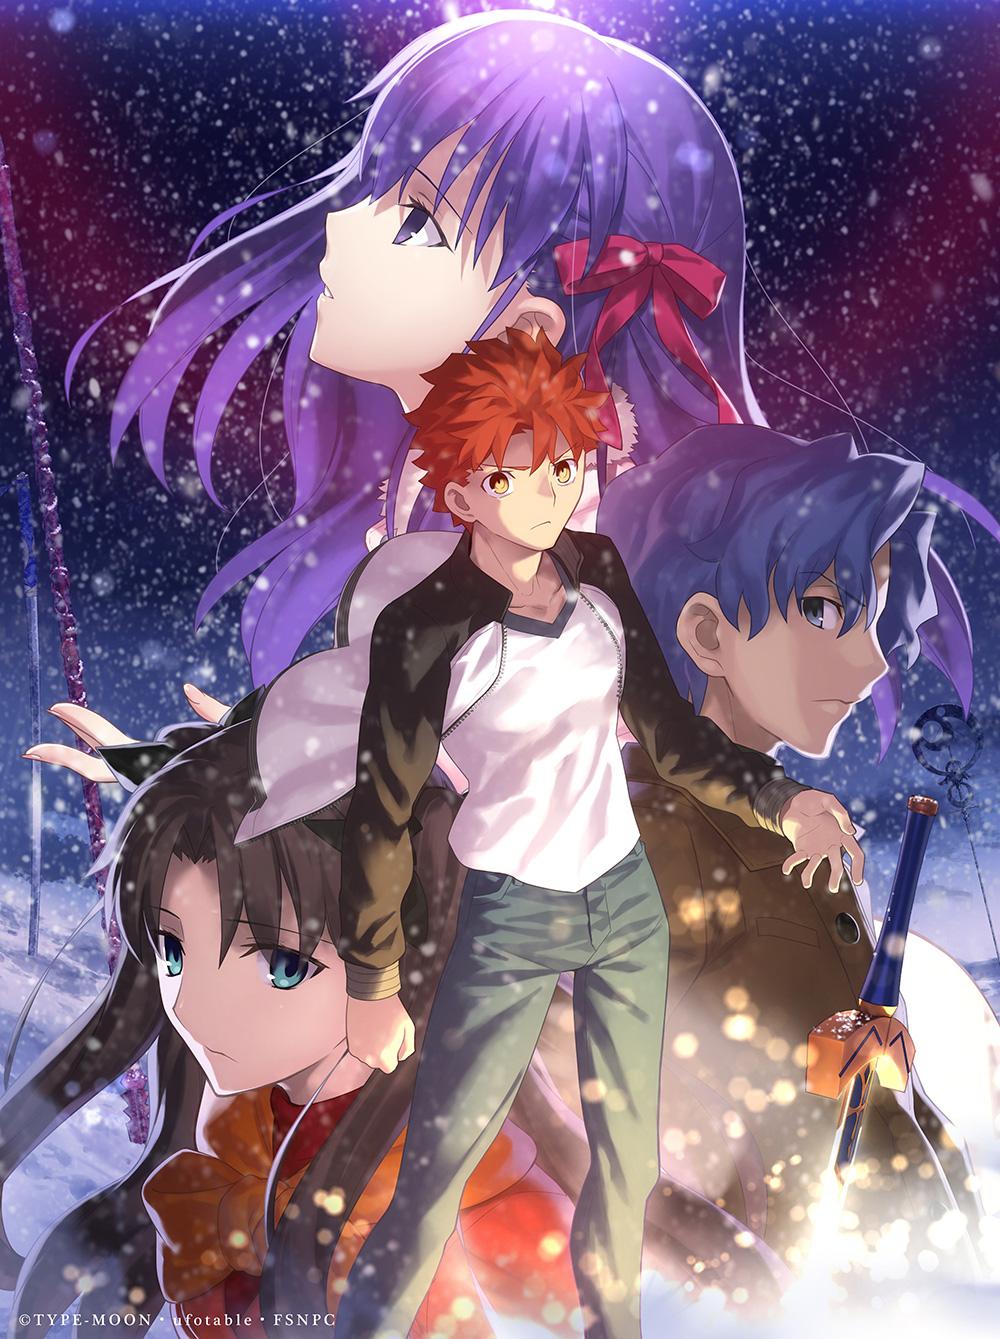 Fate-stay-night-Heavens-Feel-–-I-.Presage-Flower-Bllu-ray-Cover